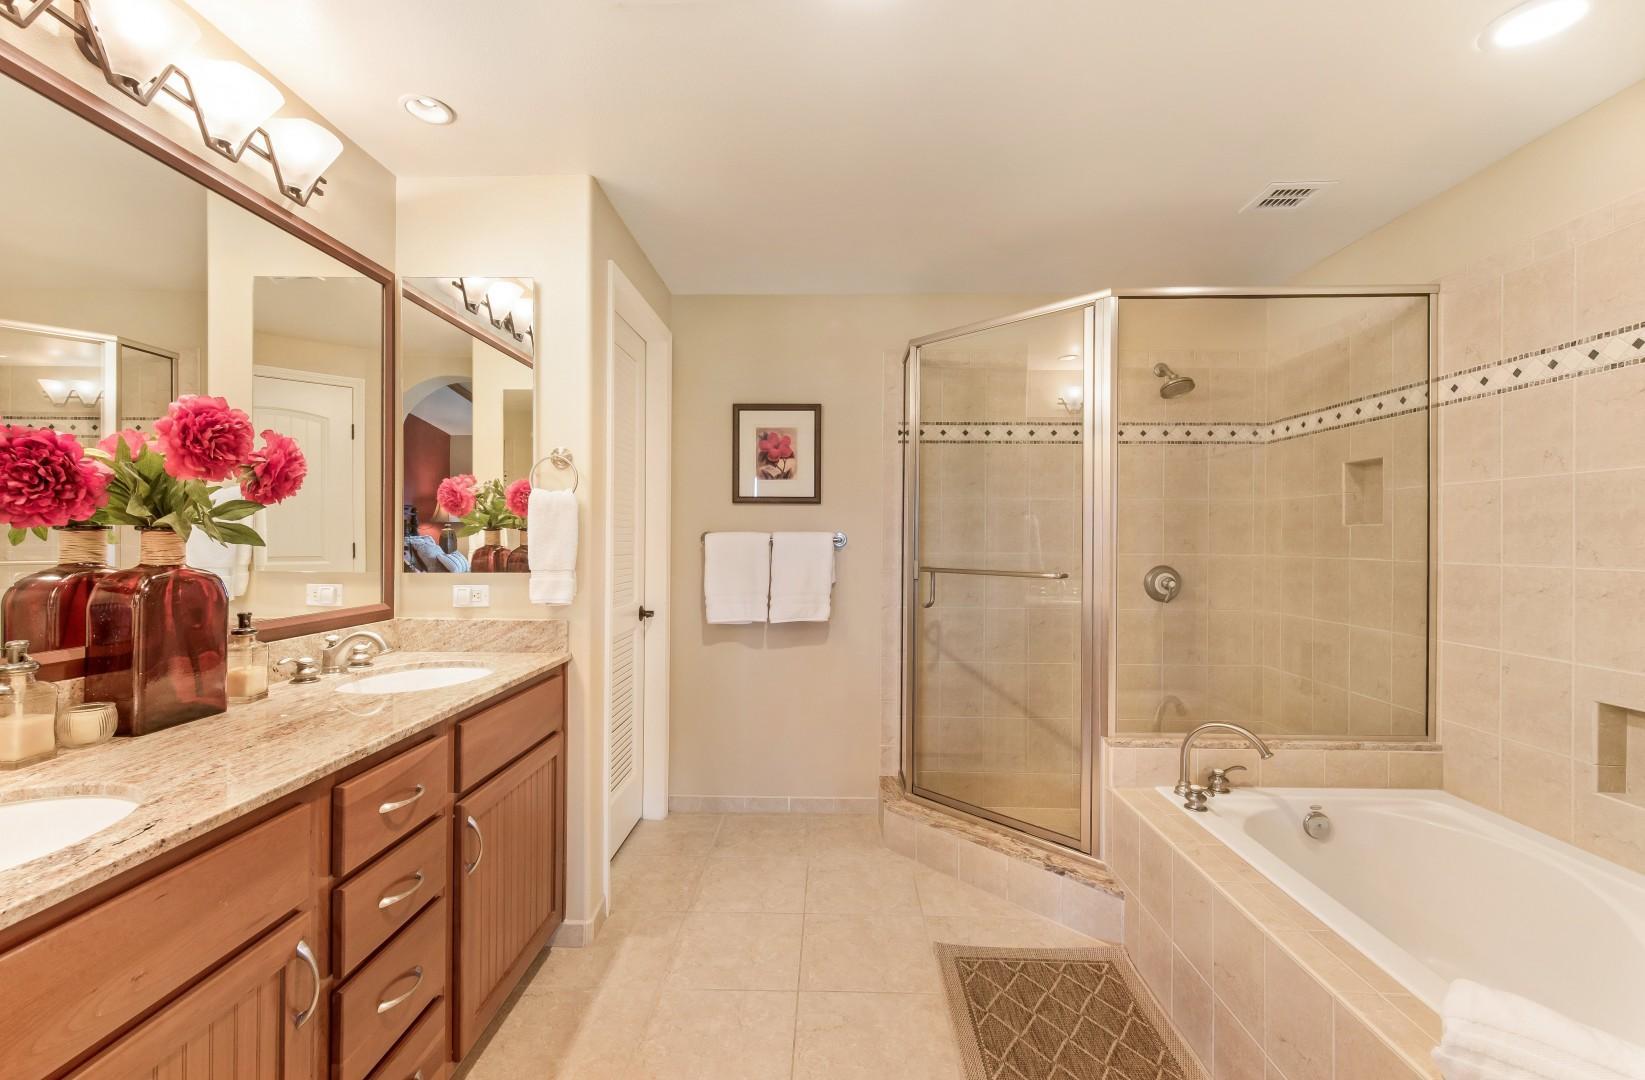 Master Bath w/ Soaking Tub, Glass Shower & Walk-In Closet